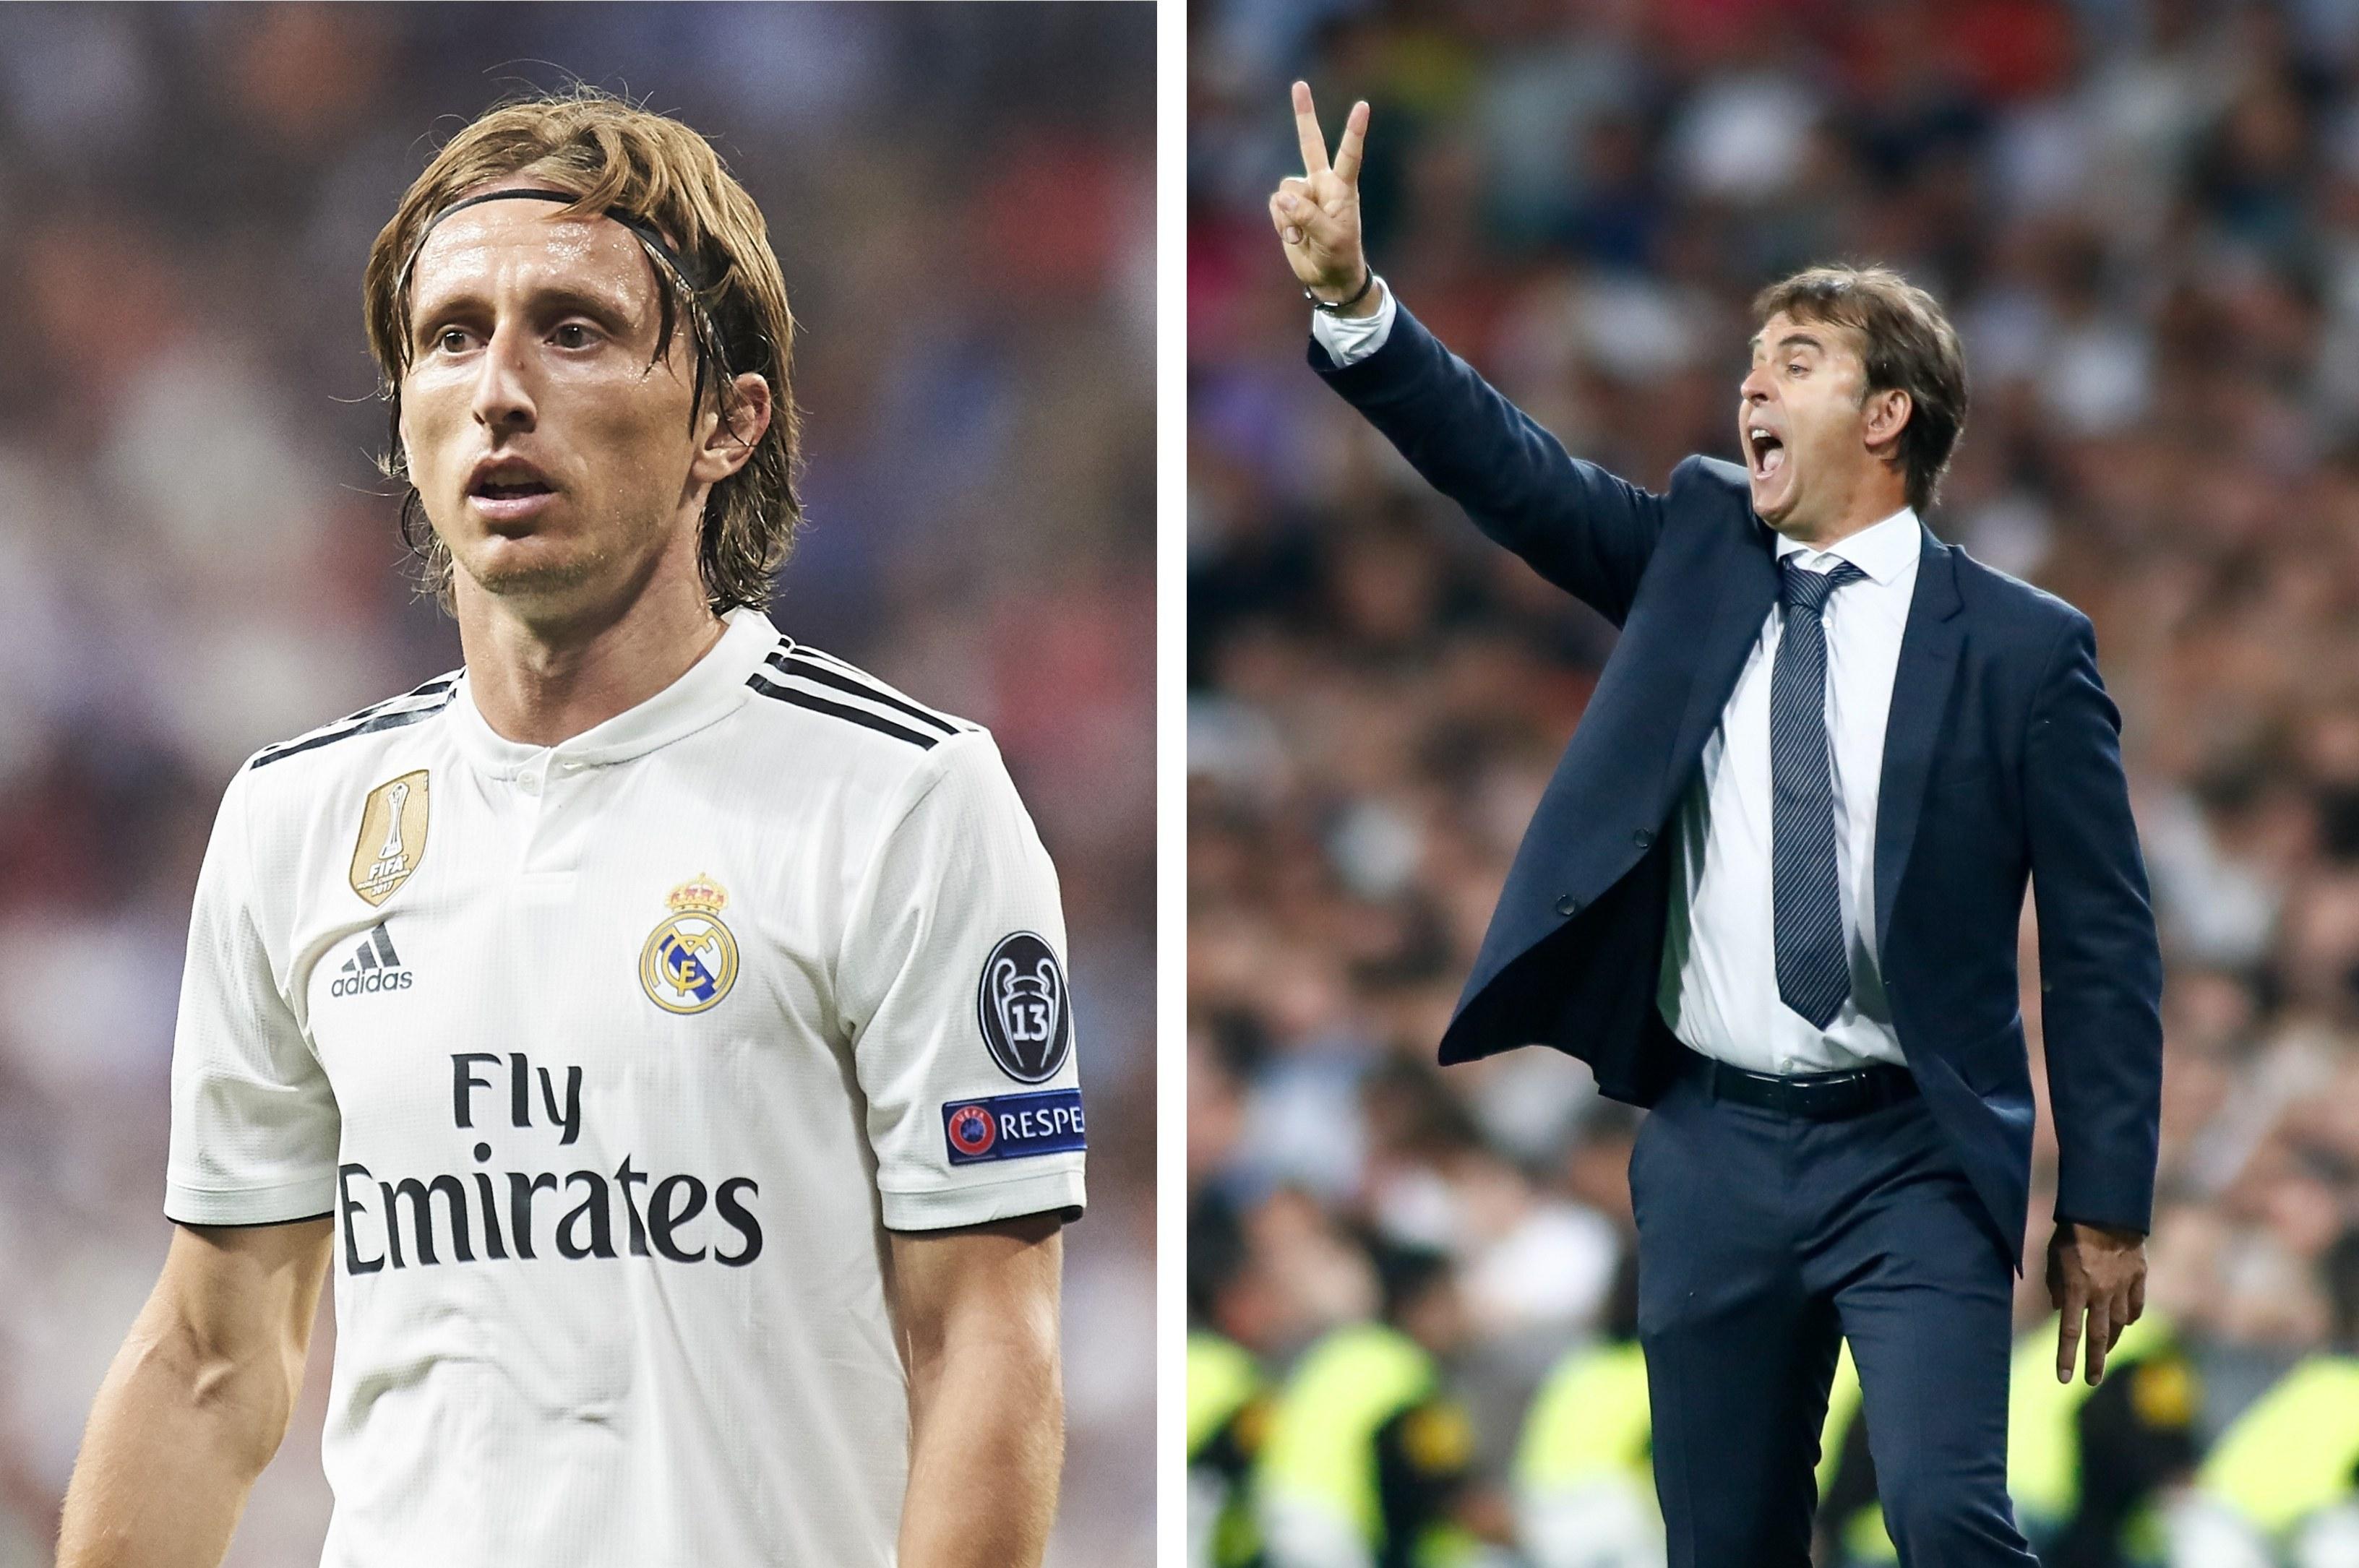 Real Madrid Ready To Splash €80m To Secure Luka Modrić's Successor